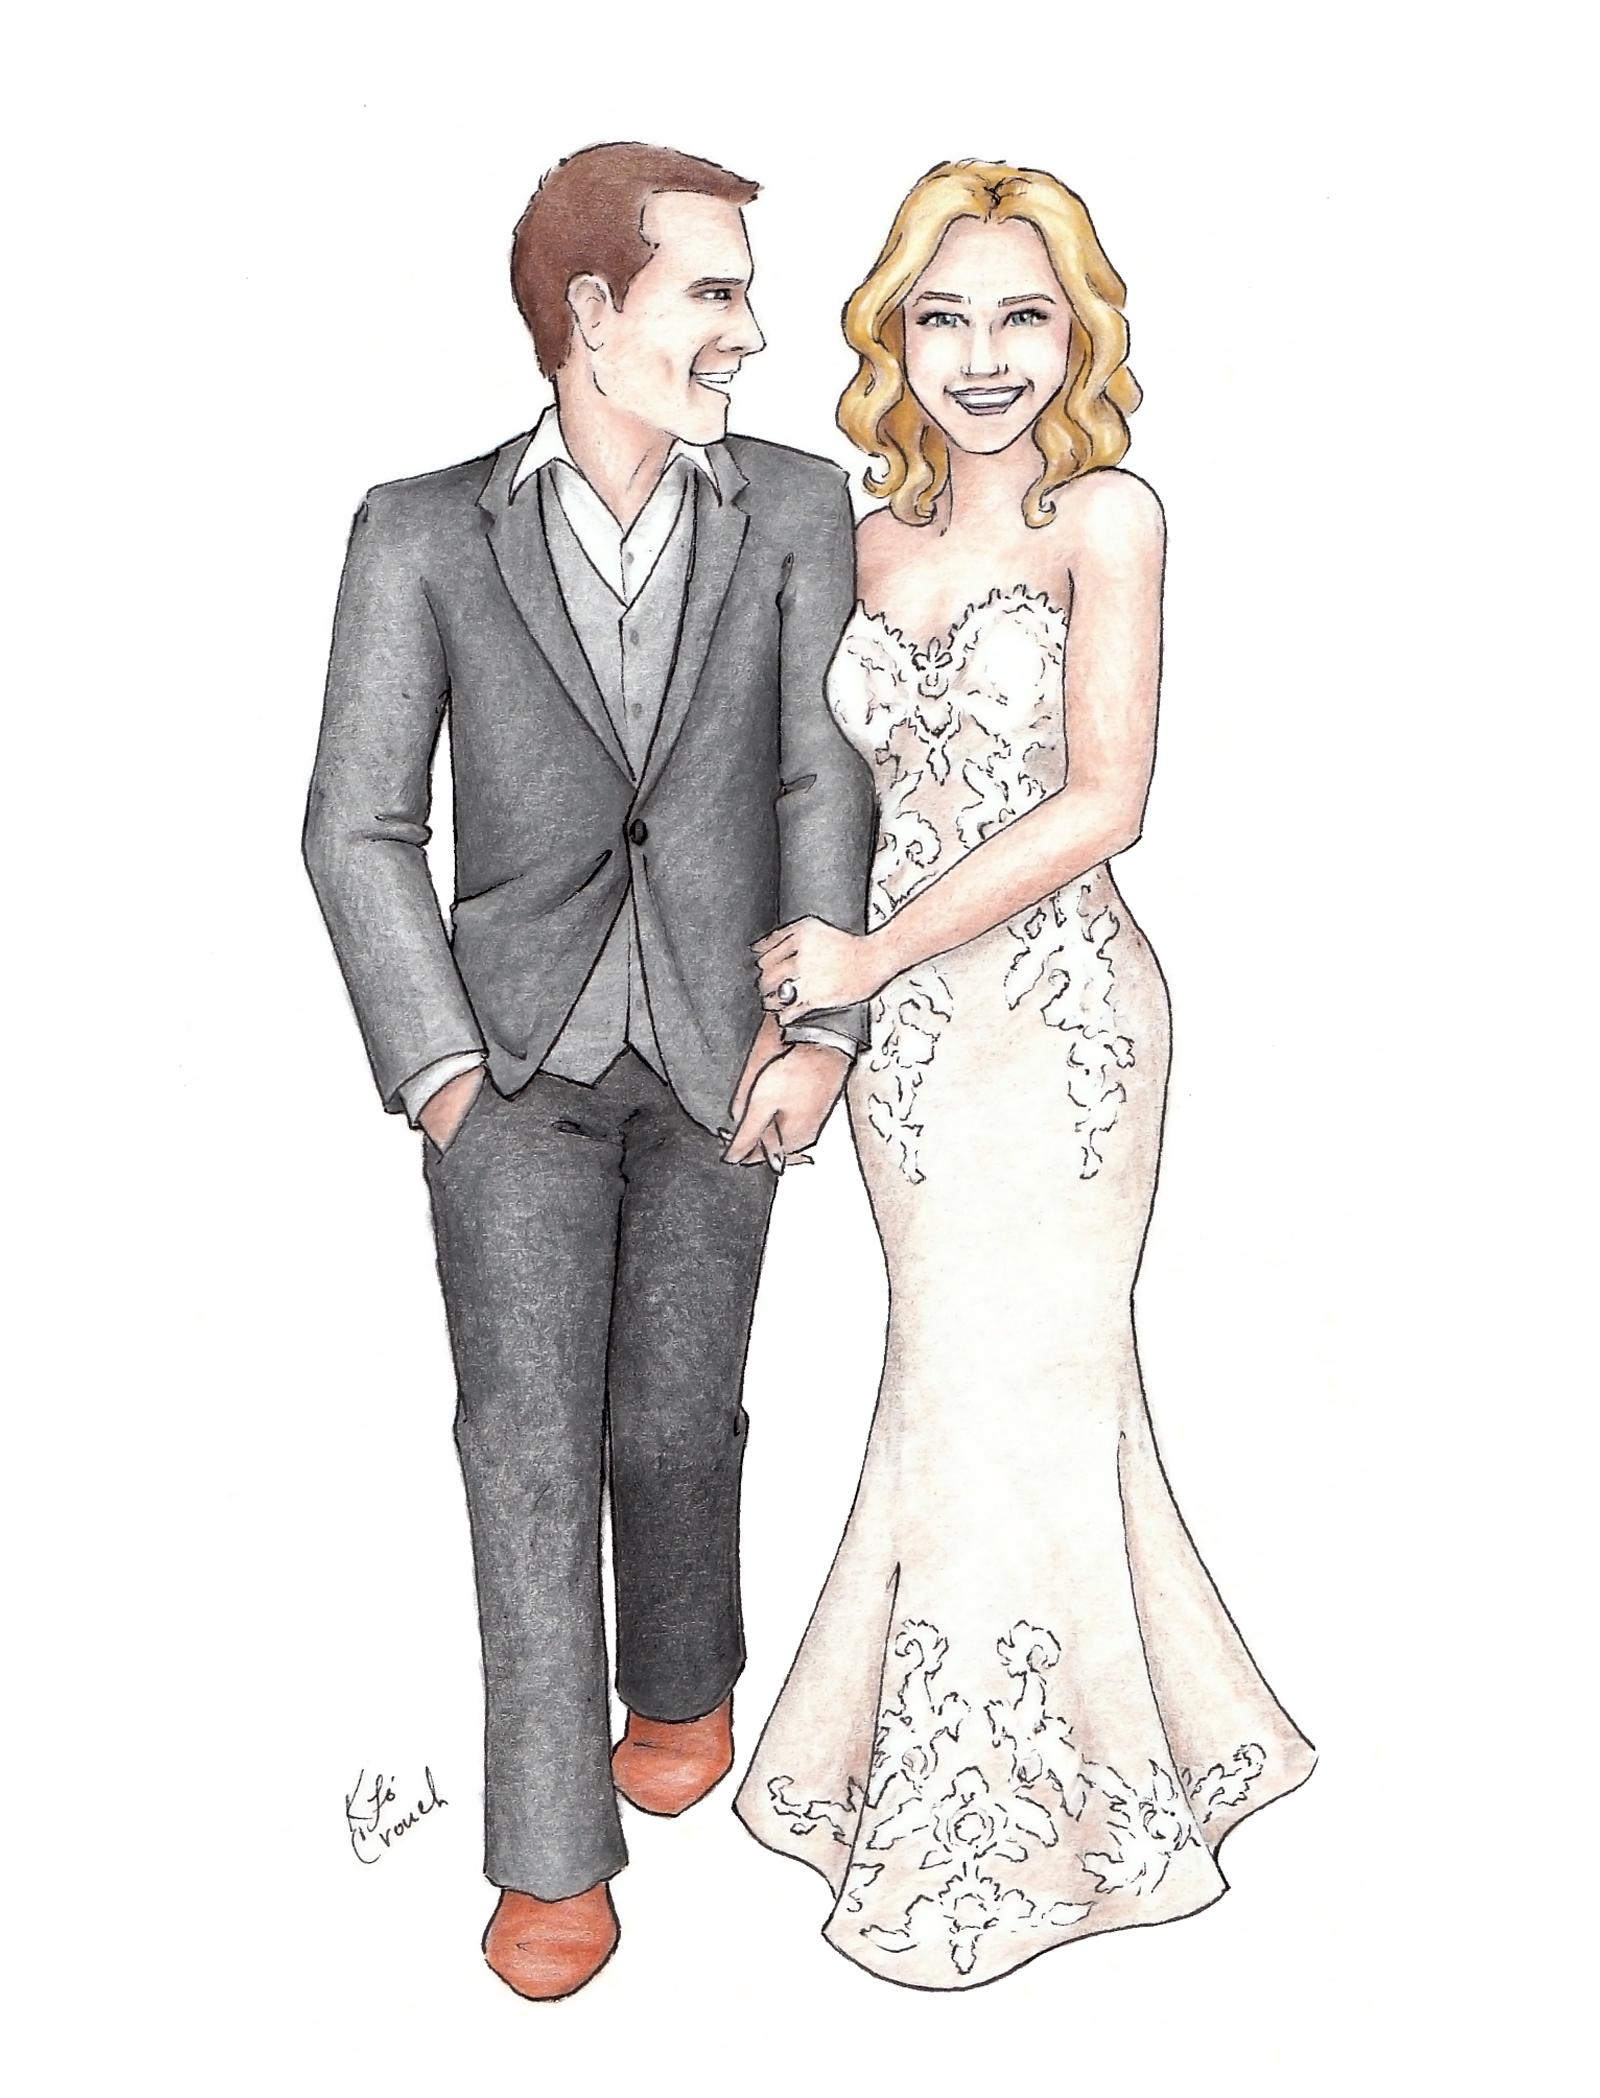 Custom watercolor bridal portrait. Fine art bride and groom portrait for a unique anniversary gift. #customportrait #portraitillustration #blusheddesign #watercolorportrait